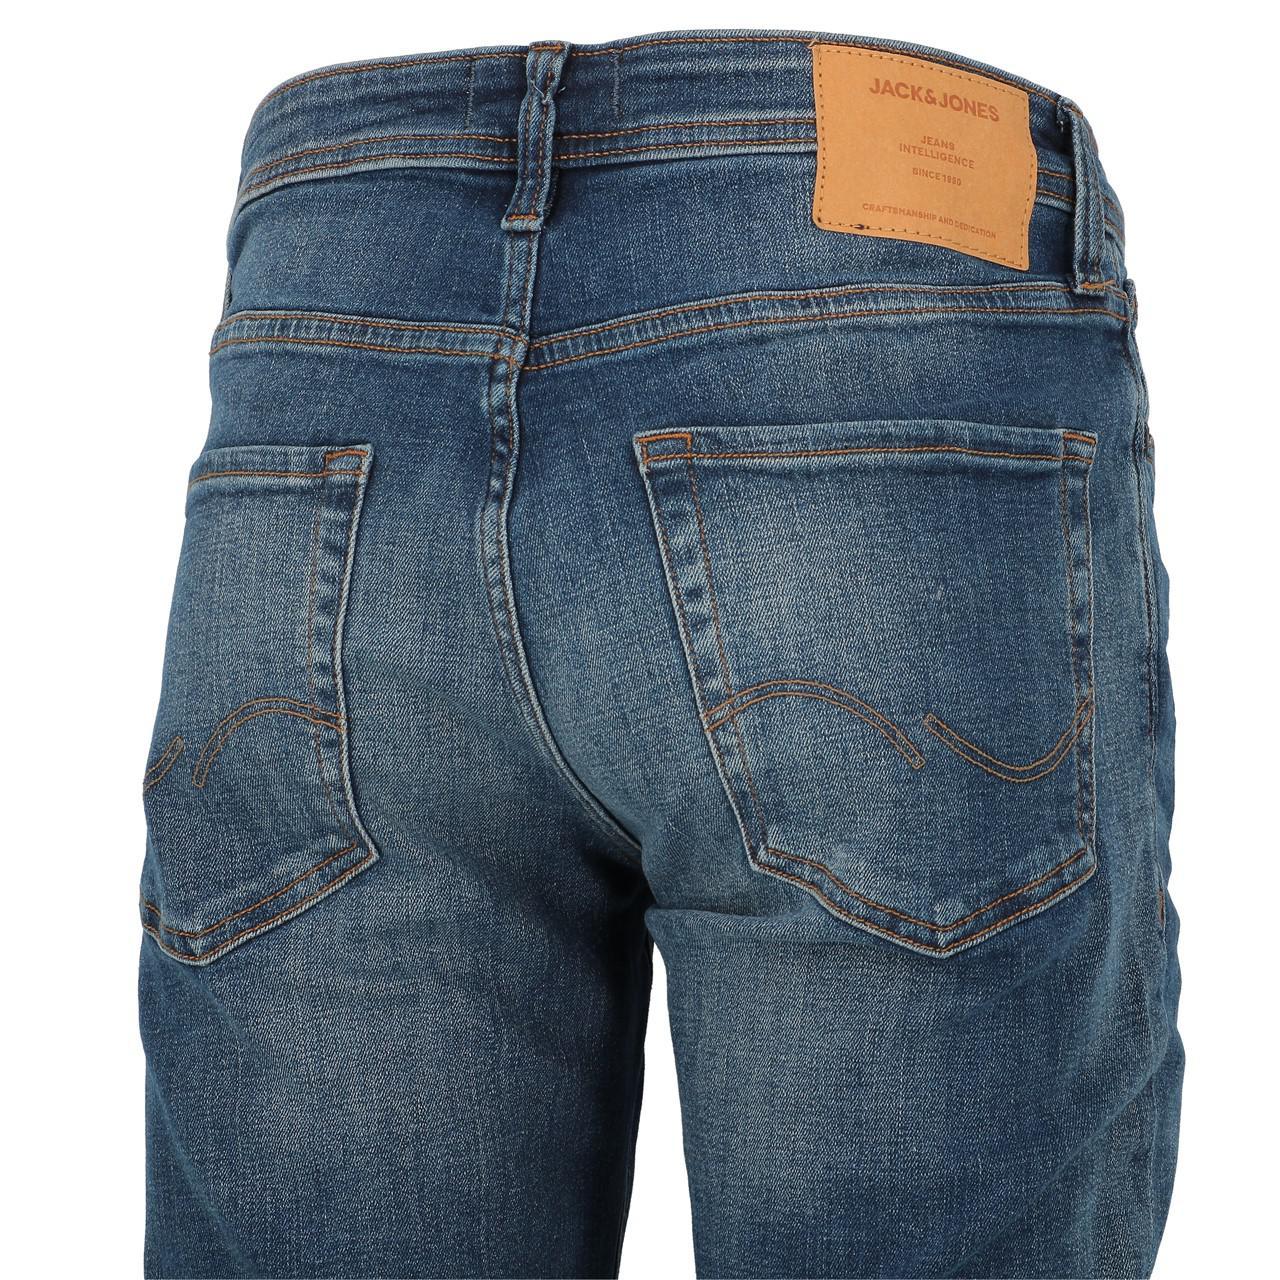 Jeans-Pants-Jack-and-jones-Tim-34-Blue-Denim-Blue-Jeans-19918-New thumbnail 3